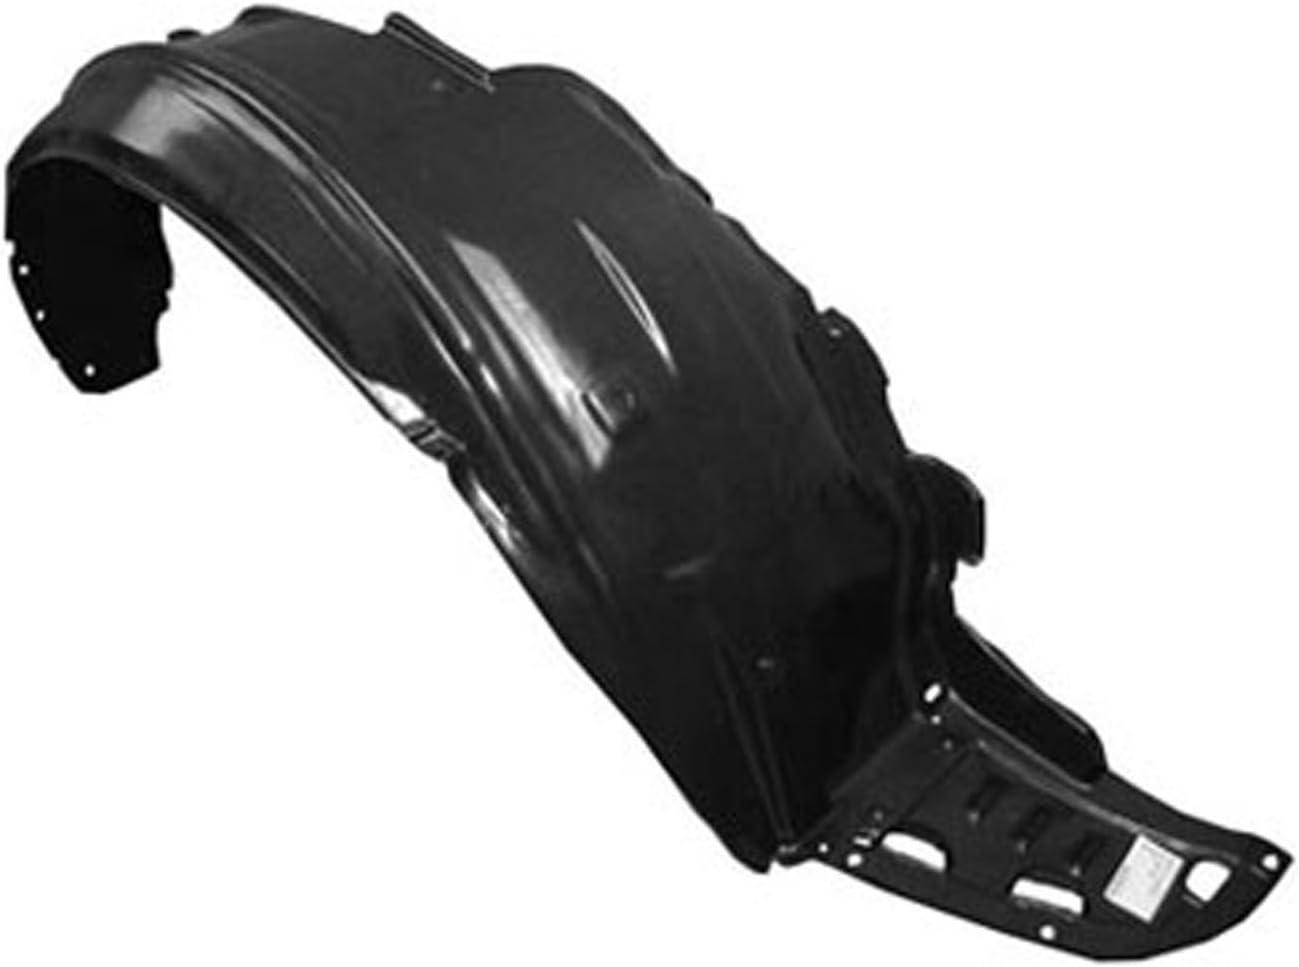 CPP AC1251100 Right Fender Splash Shield for 2005-2008 Acura RL